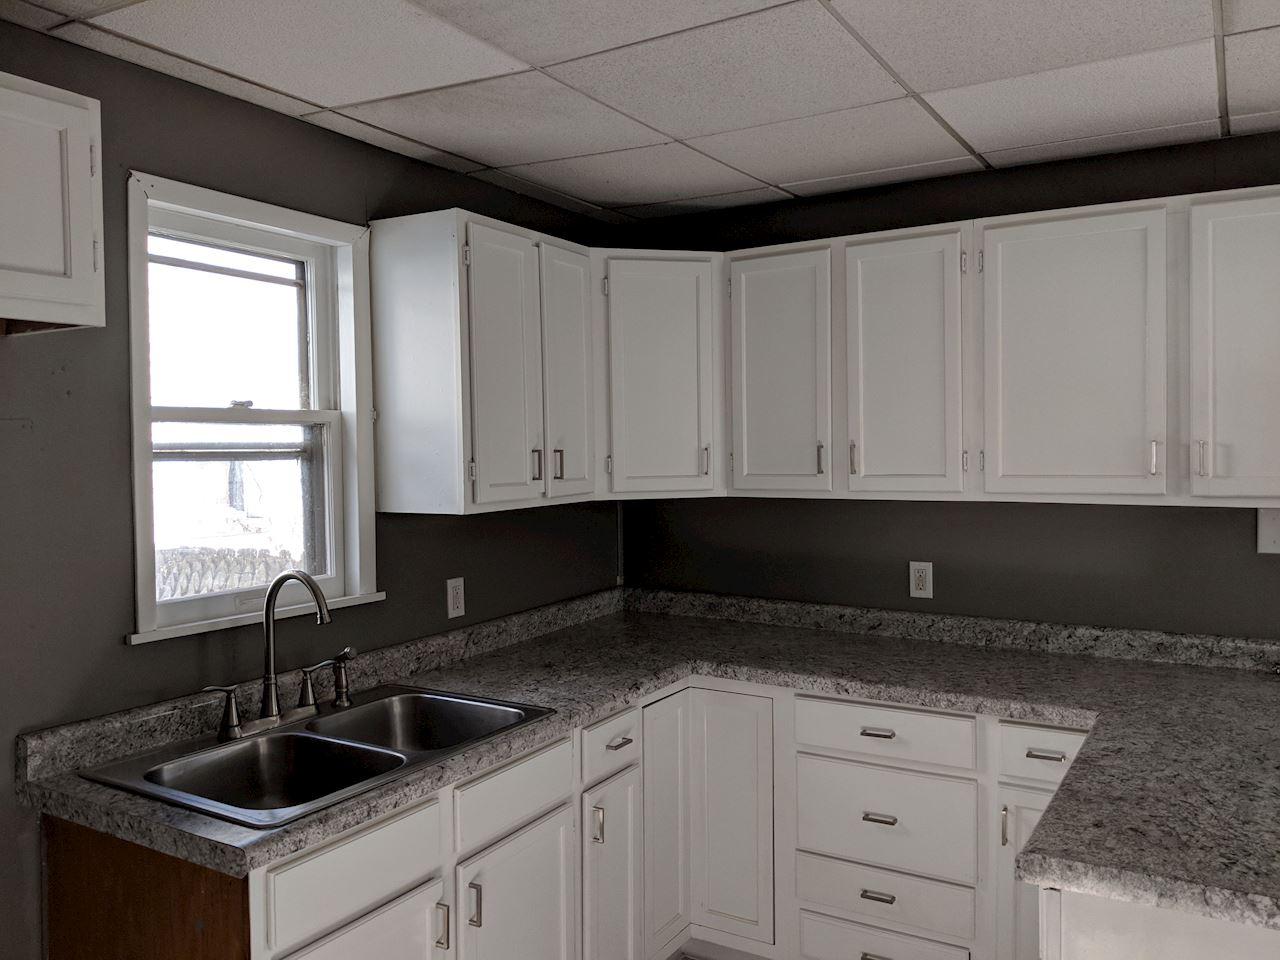 investment property - 142 Jackson St, Michigan City, IN 46360, La Porte - image 2